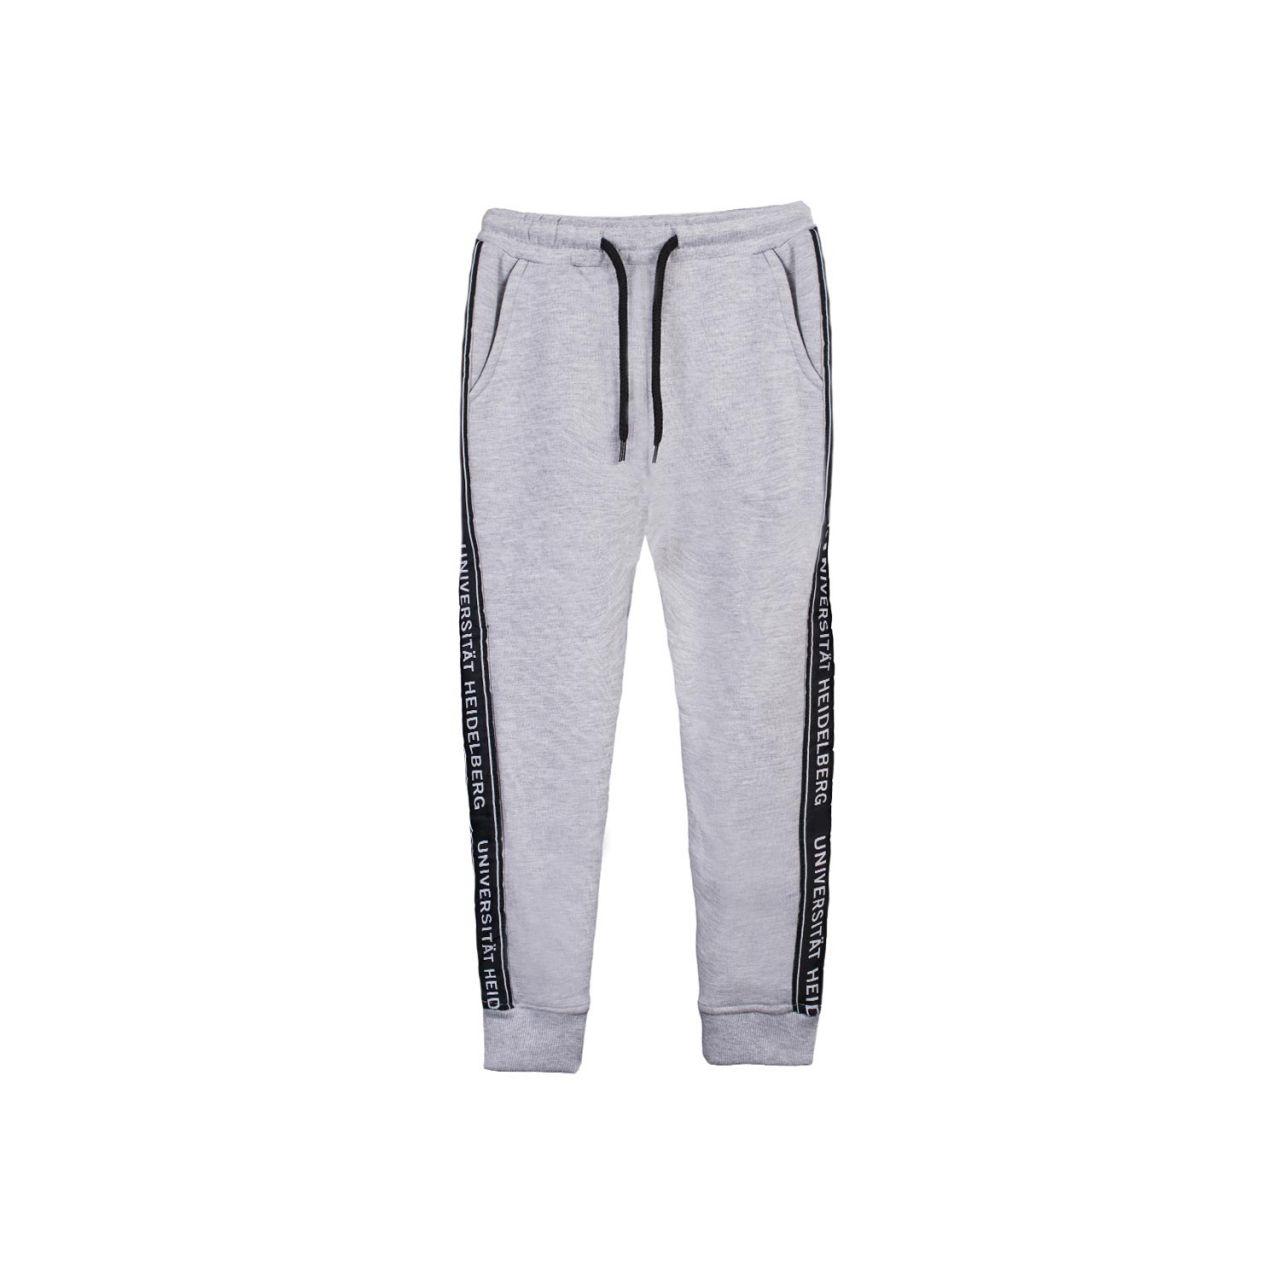 Kids Sweatpants, heather grey, tape